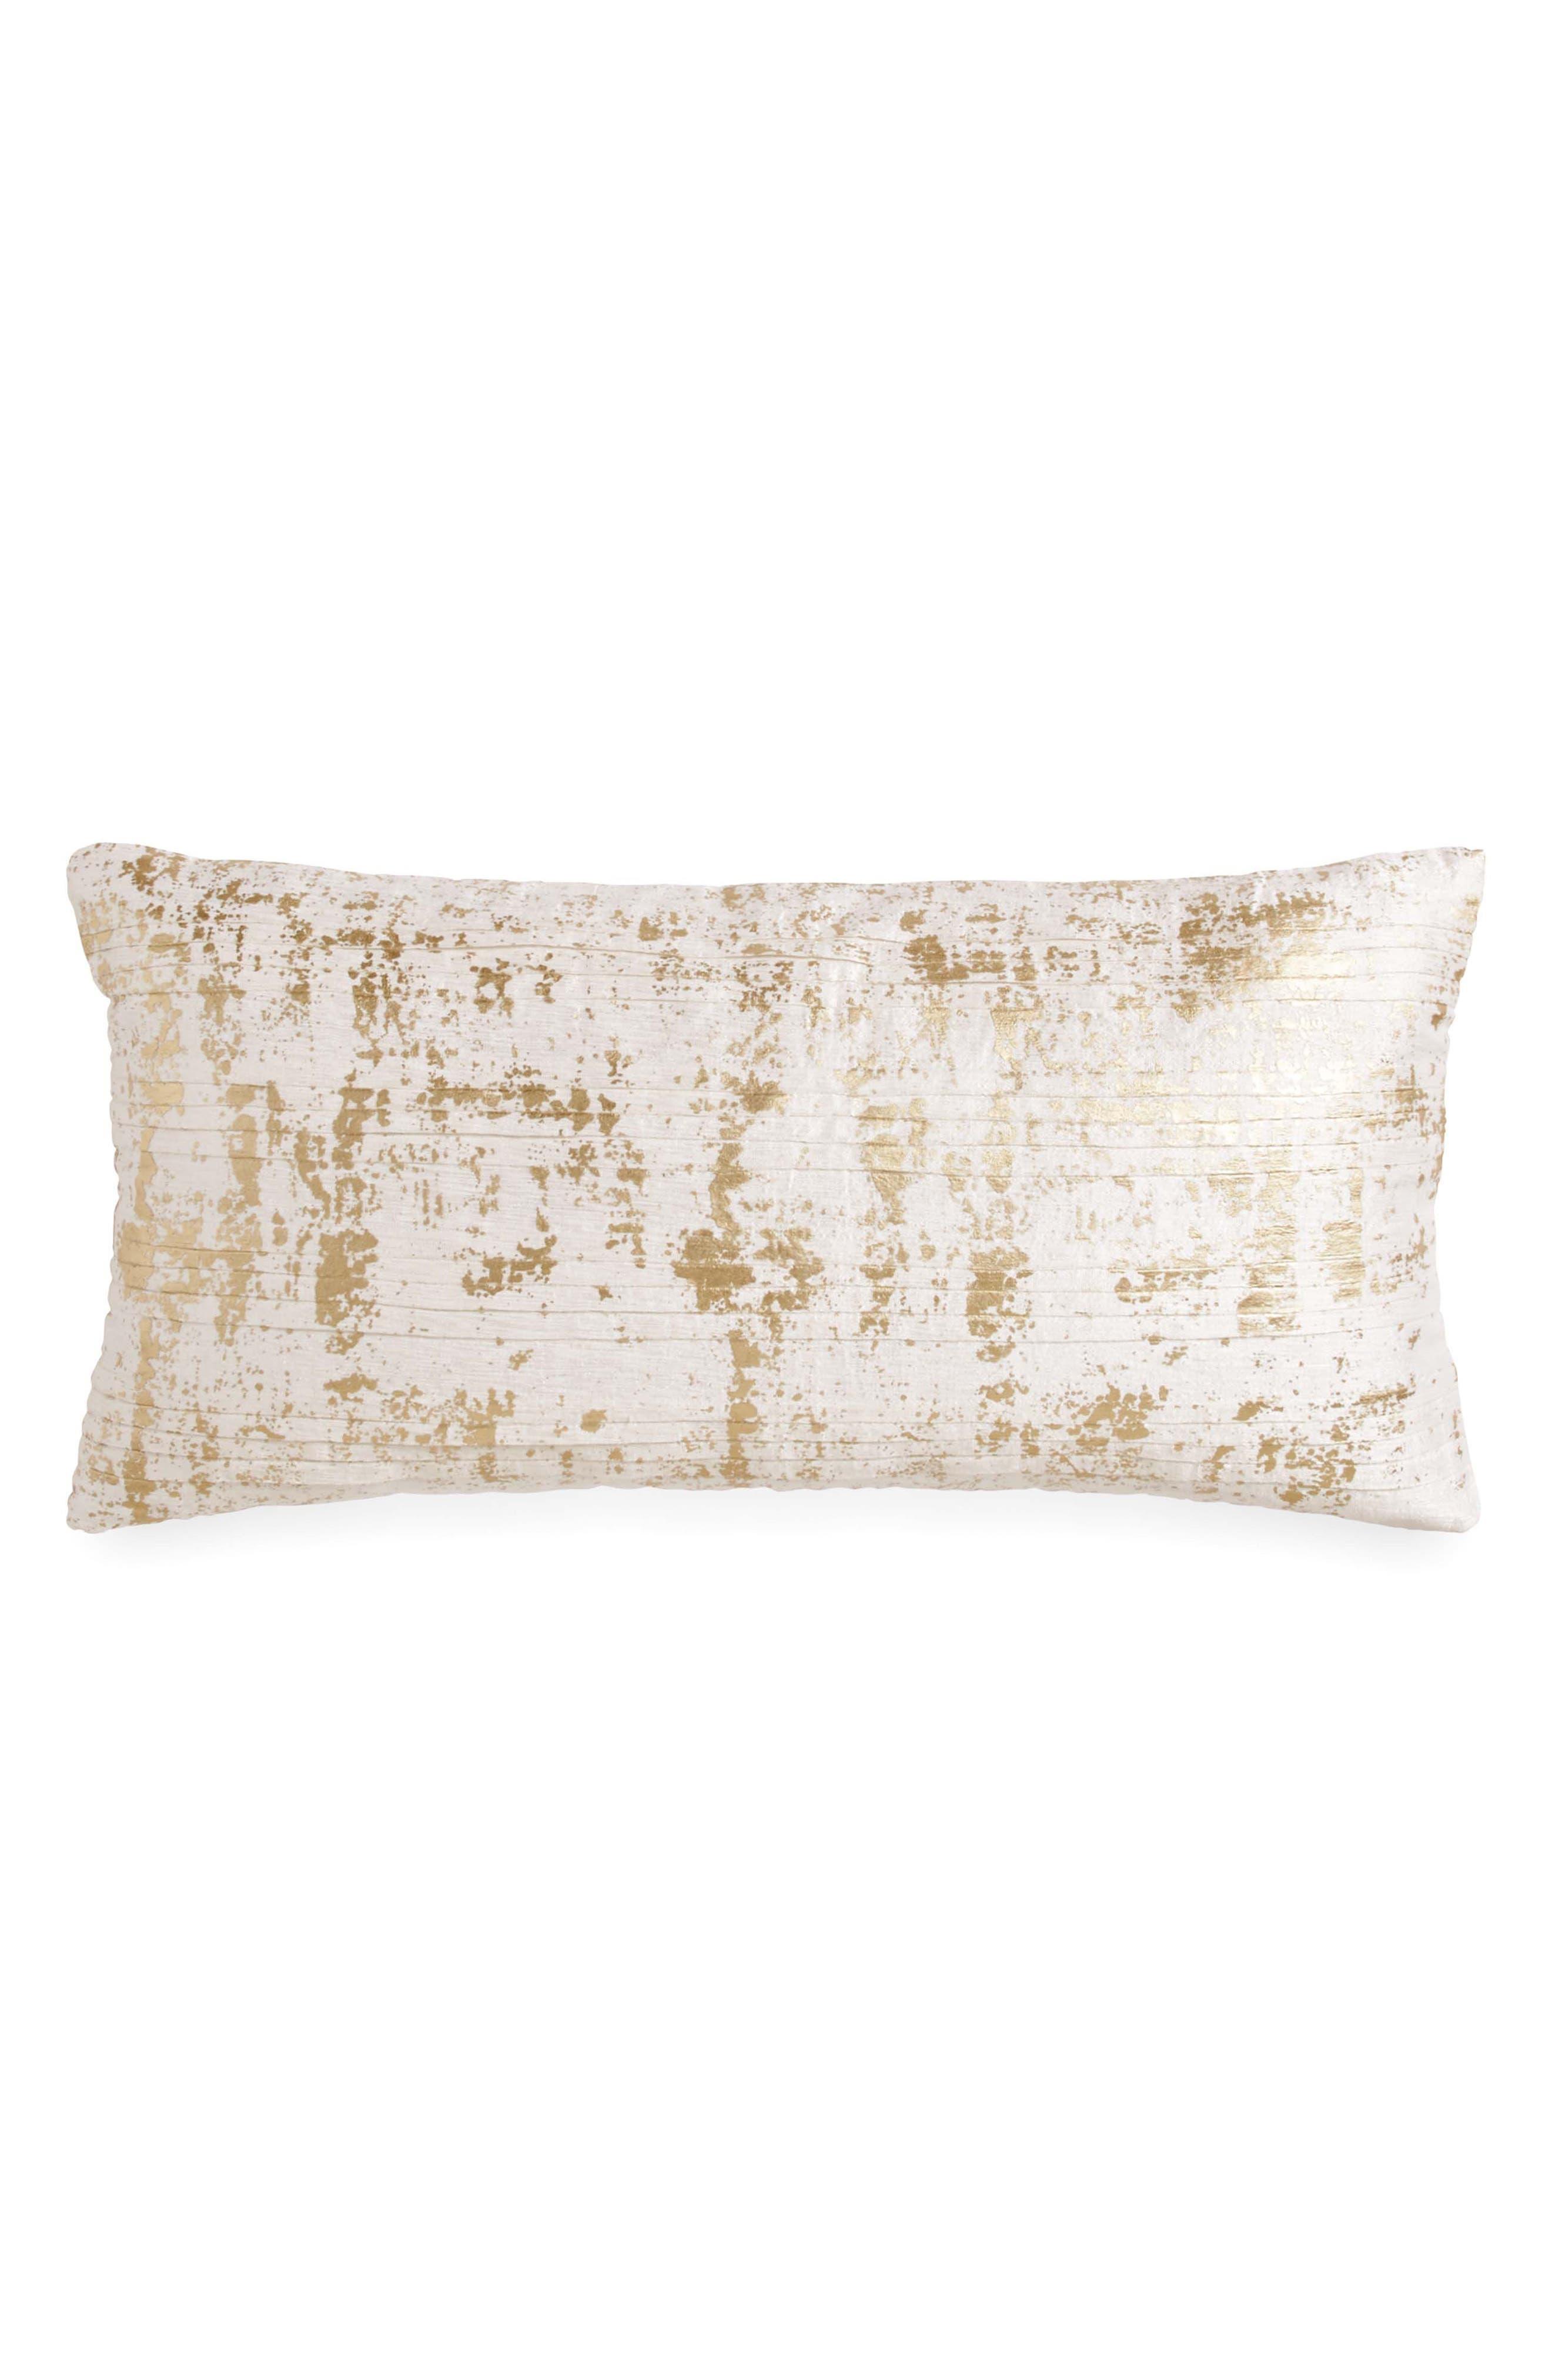 Opal Essence Pillow,                         Main,                         color, Ivory